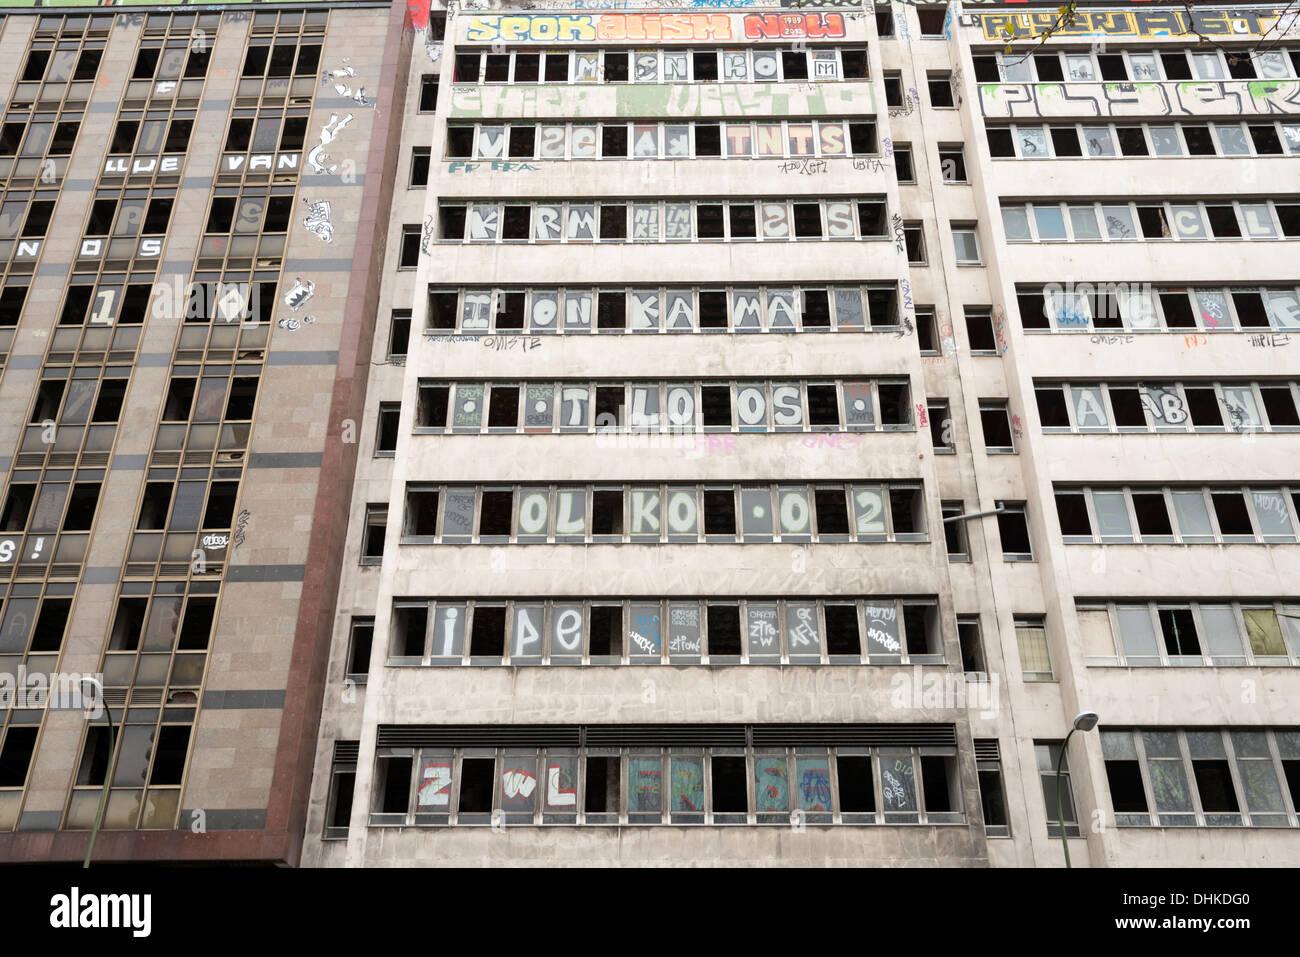 Derelict buildings on Plaza España, Madrid, Spain - Stock Image